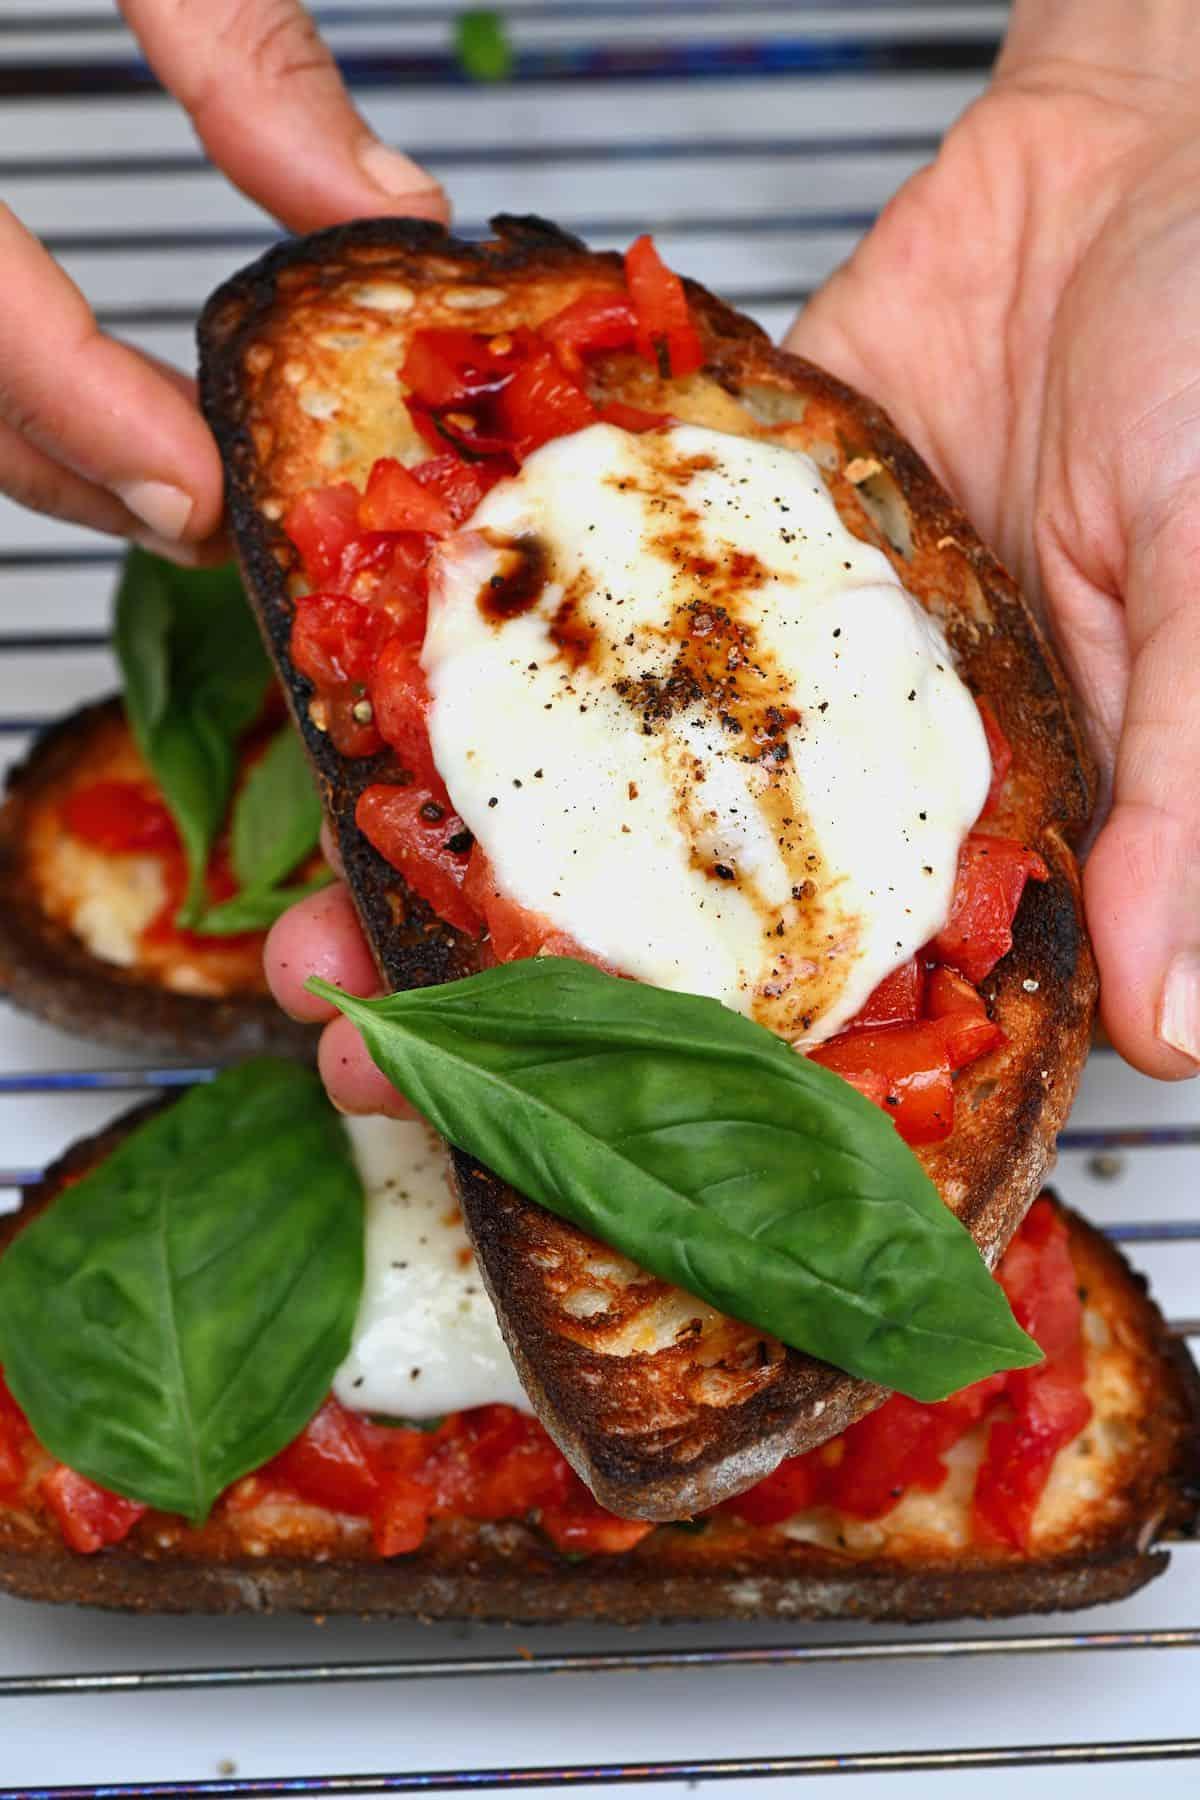 Hand holding a mozzarella bruschetta